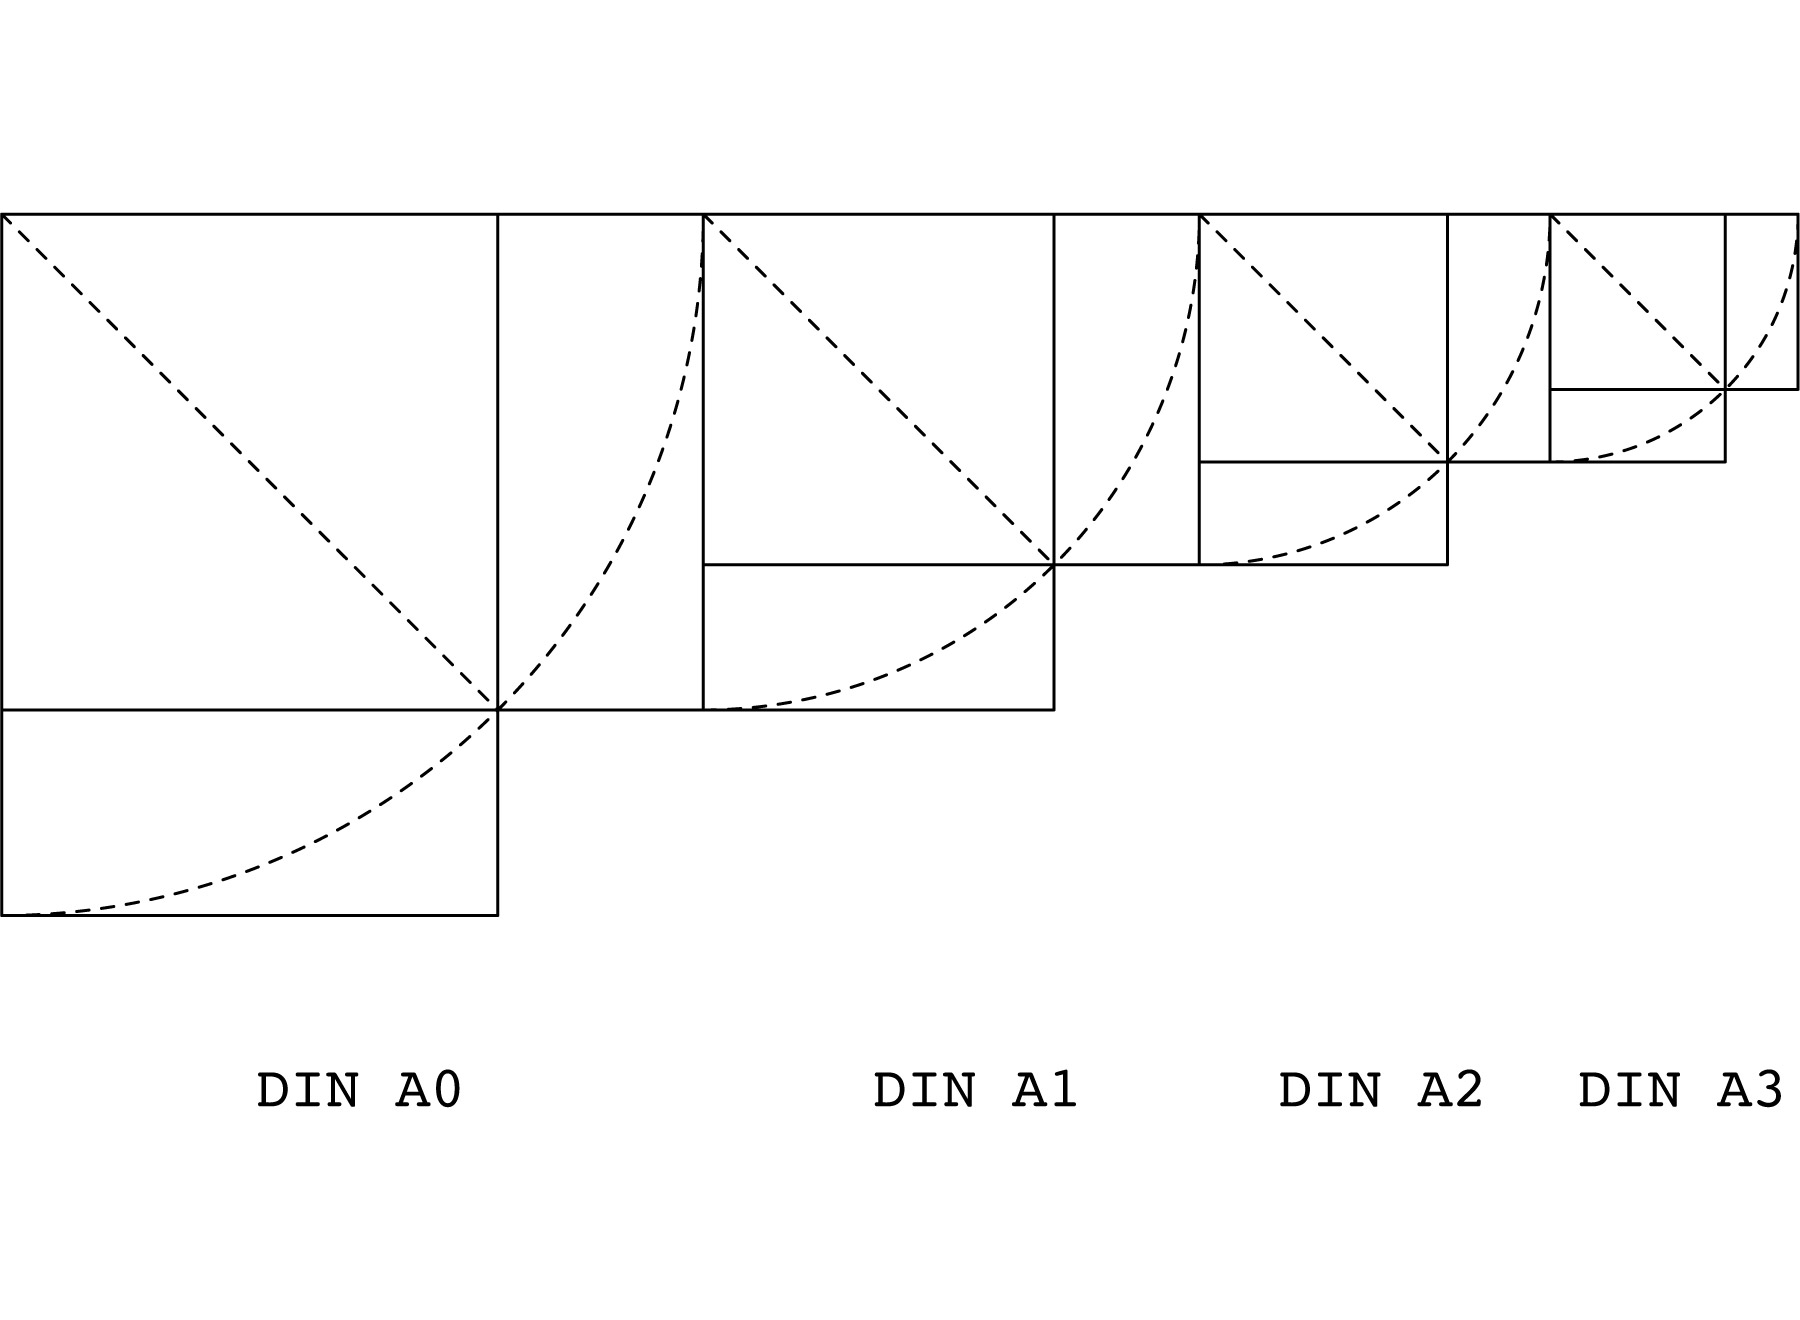 DIN system